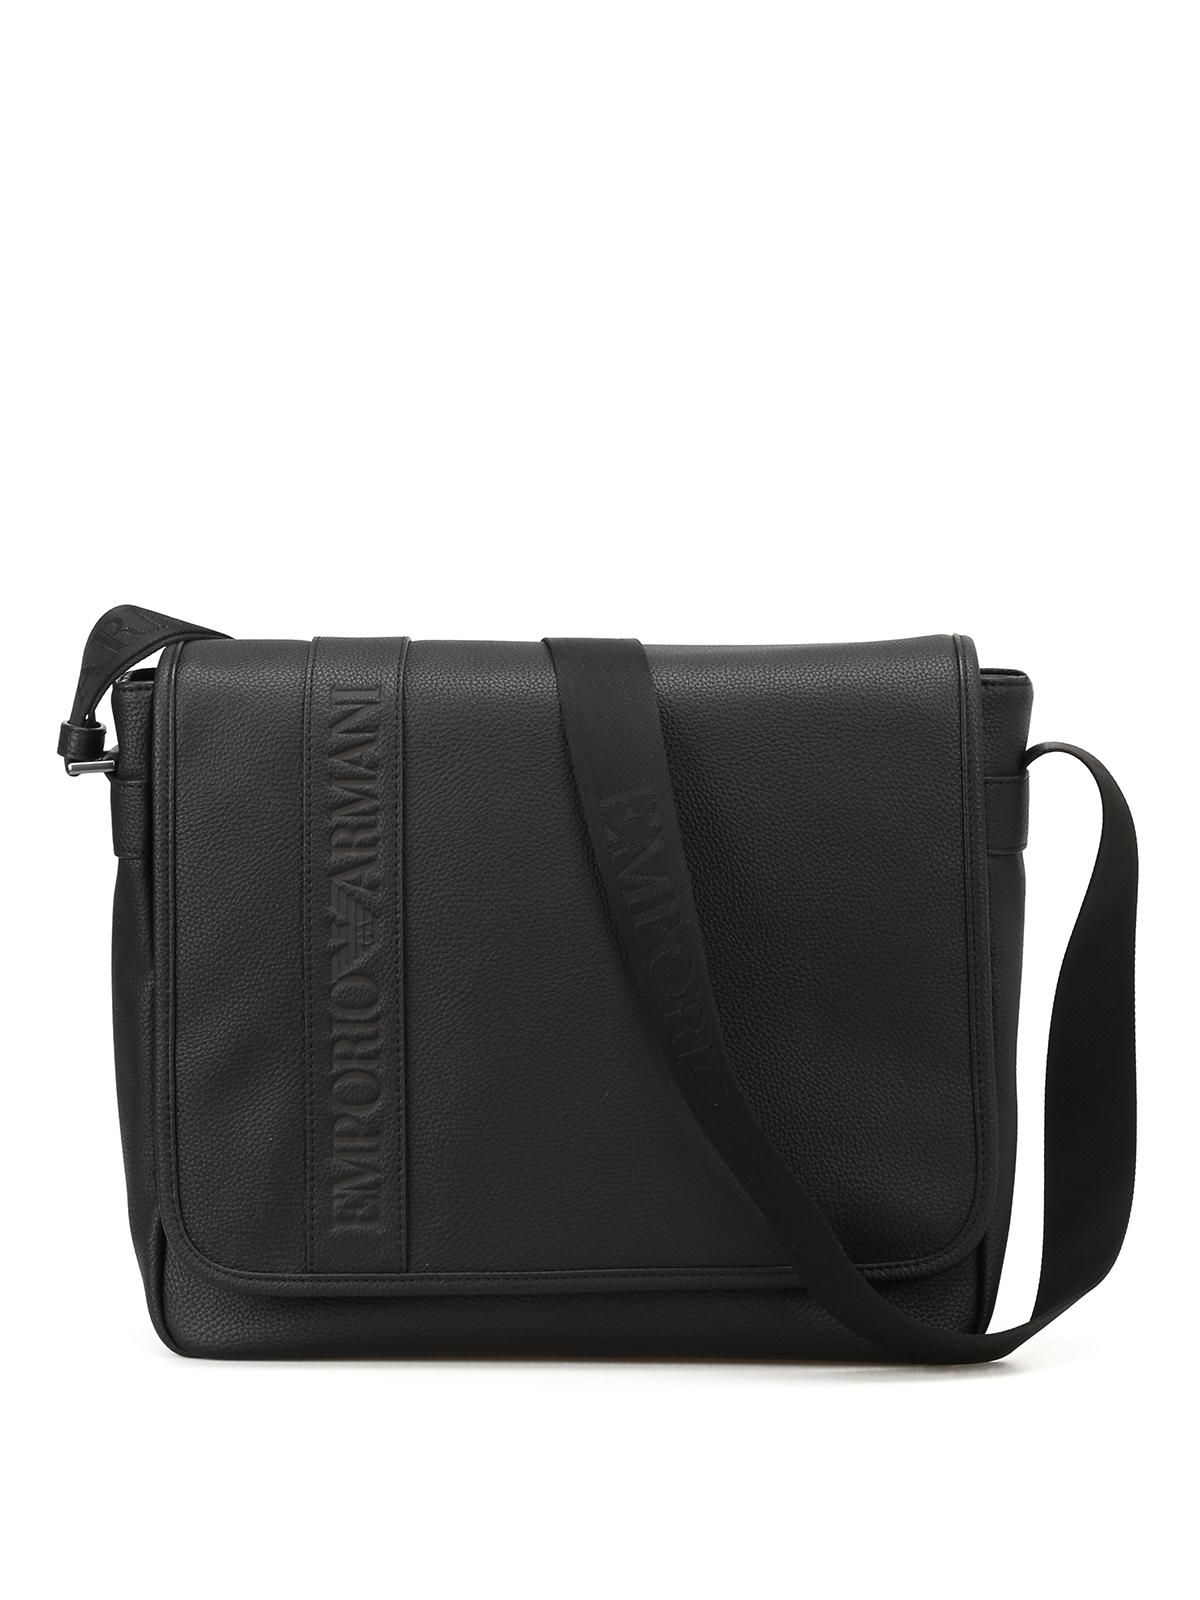 d8f1e4c0cff3 Emporio Armani - Black faux leather cross body bag - cross body bags ...